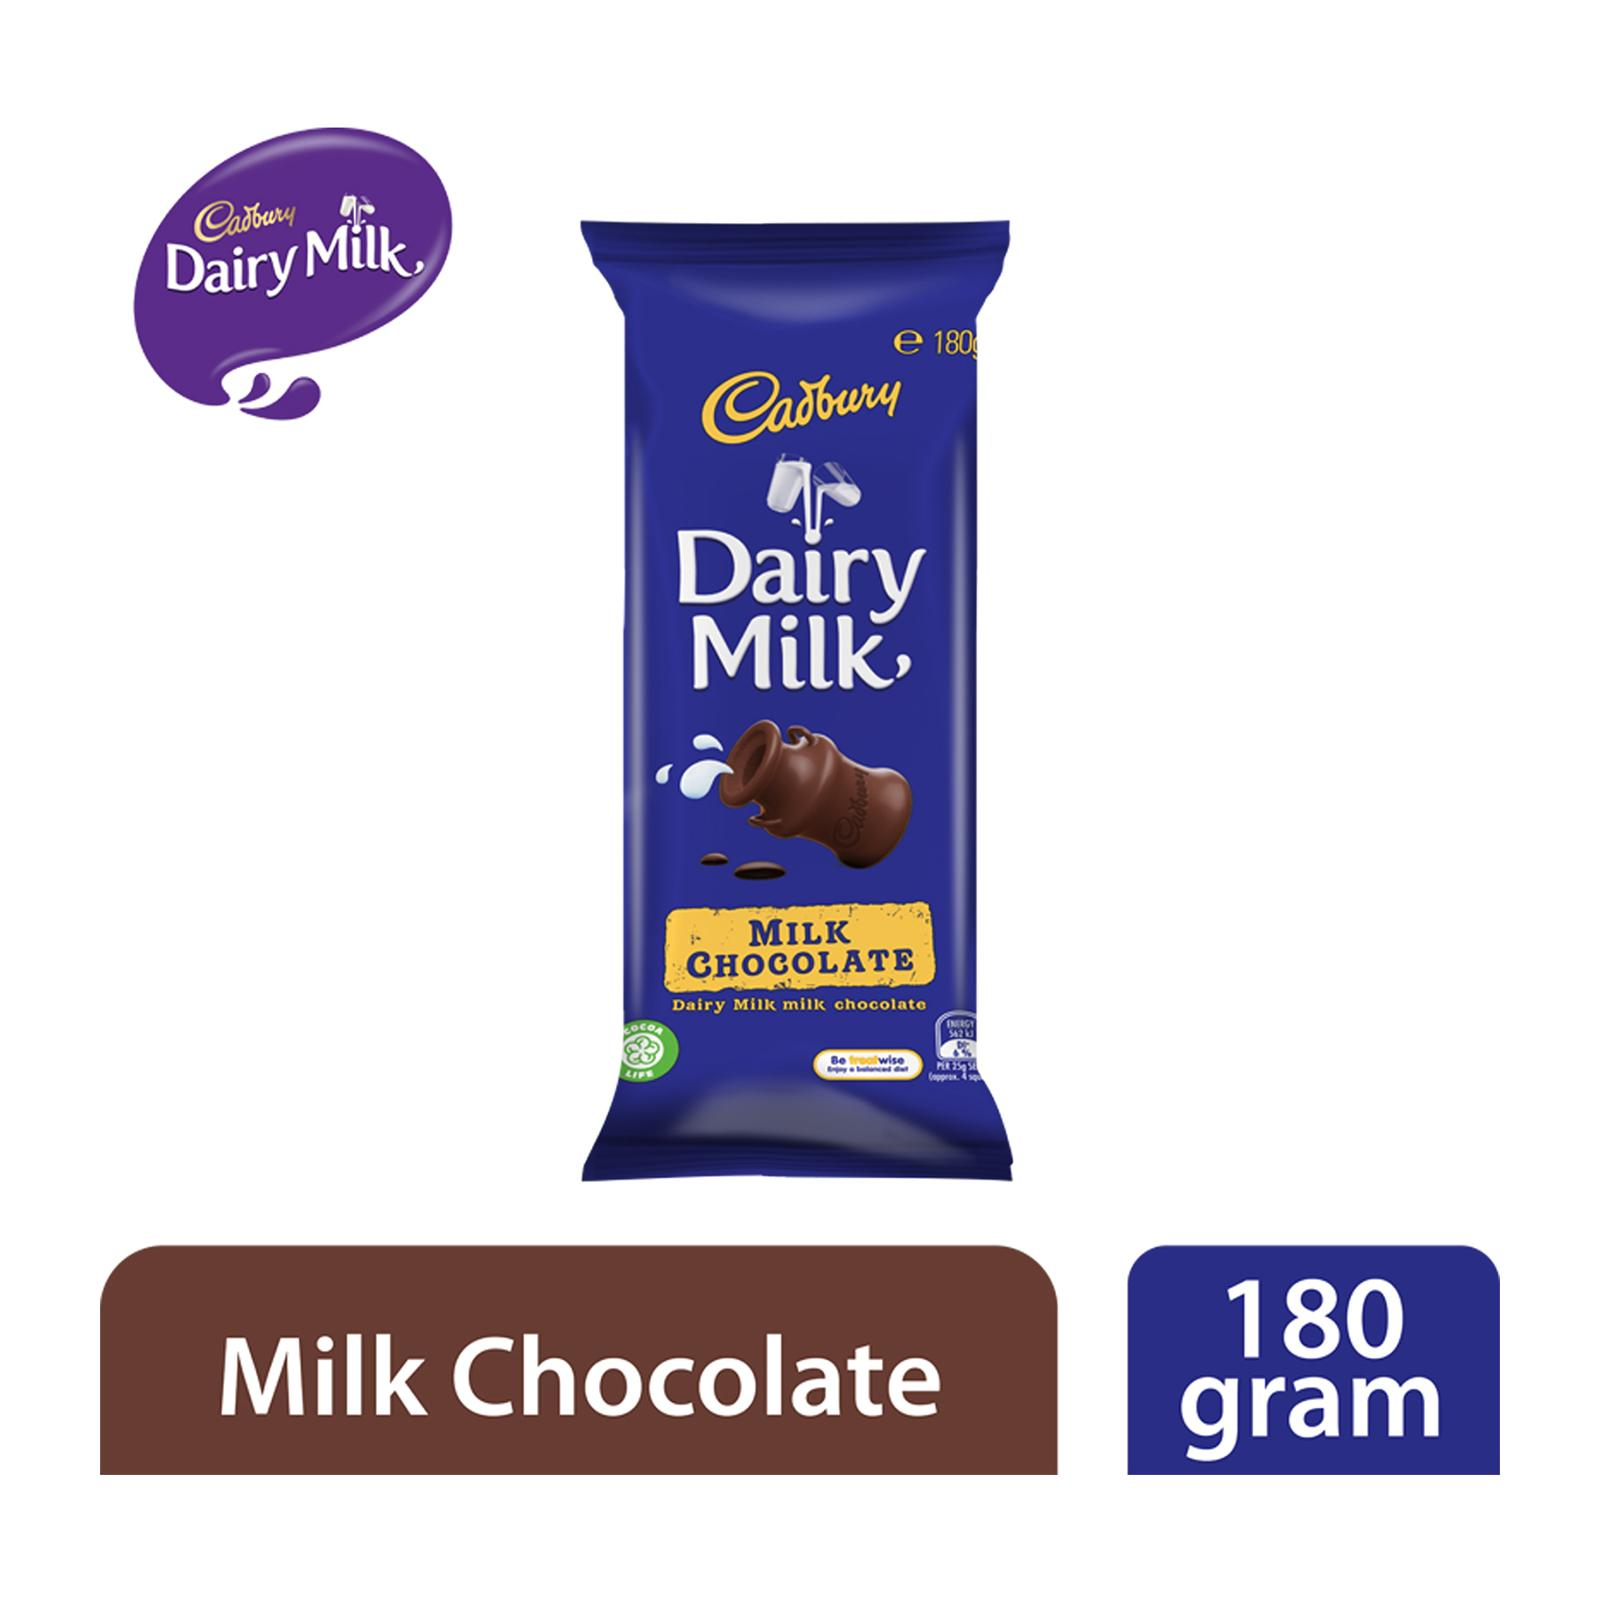 Cadbury Dairy Milk Milk Chocolate Block